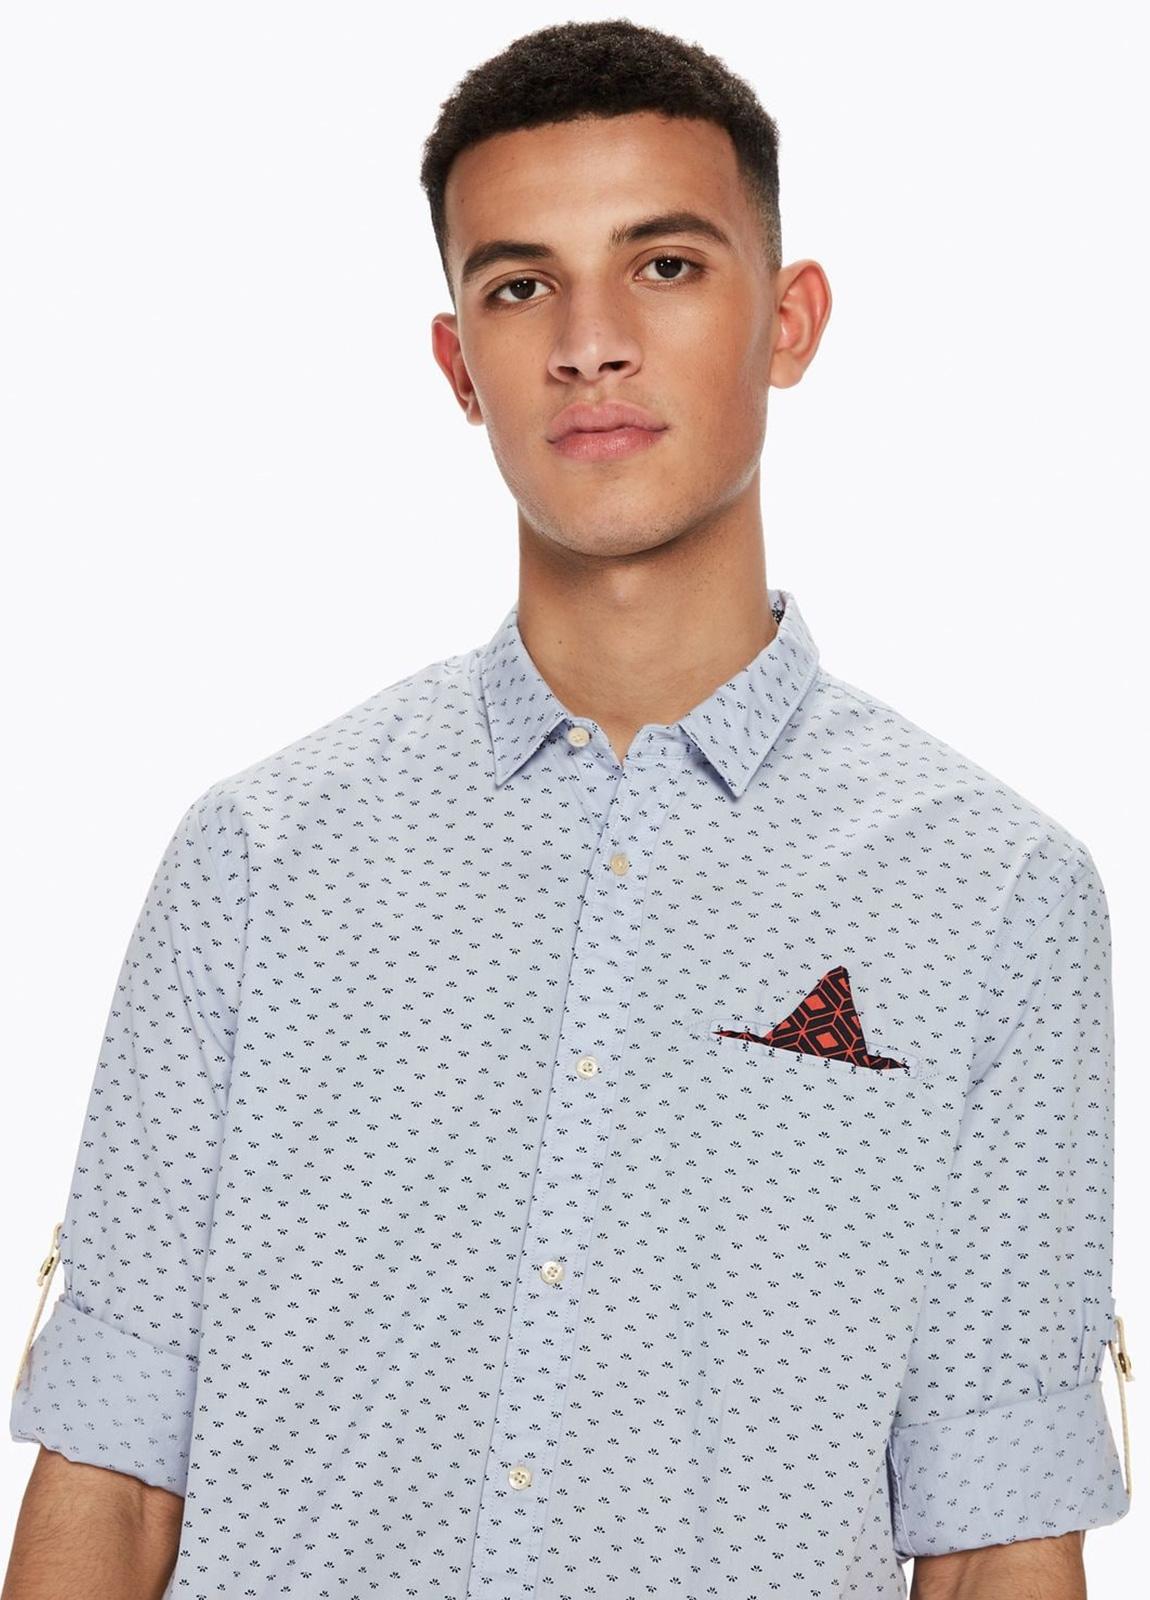 Camisa REGULAR FIT, cuello clasico de dibujo color azul celeste. Pañuelo de bolsillo fijo y presillas en mangas.100% Algodón. - Ítem3